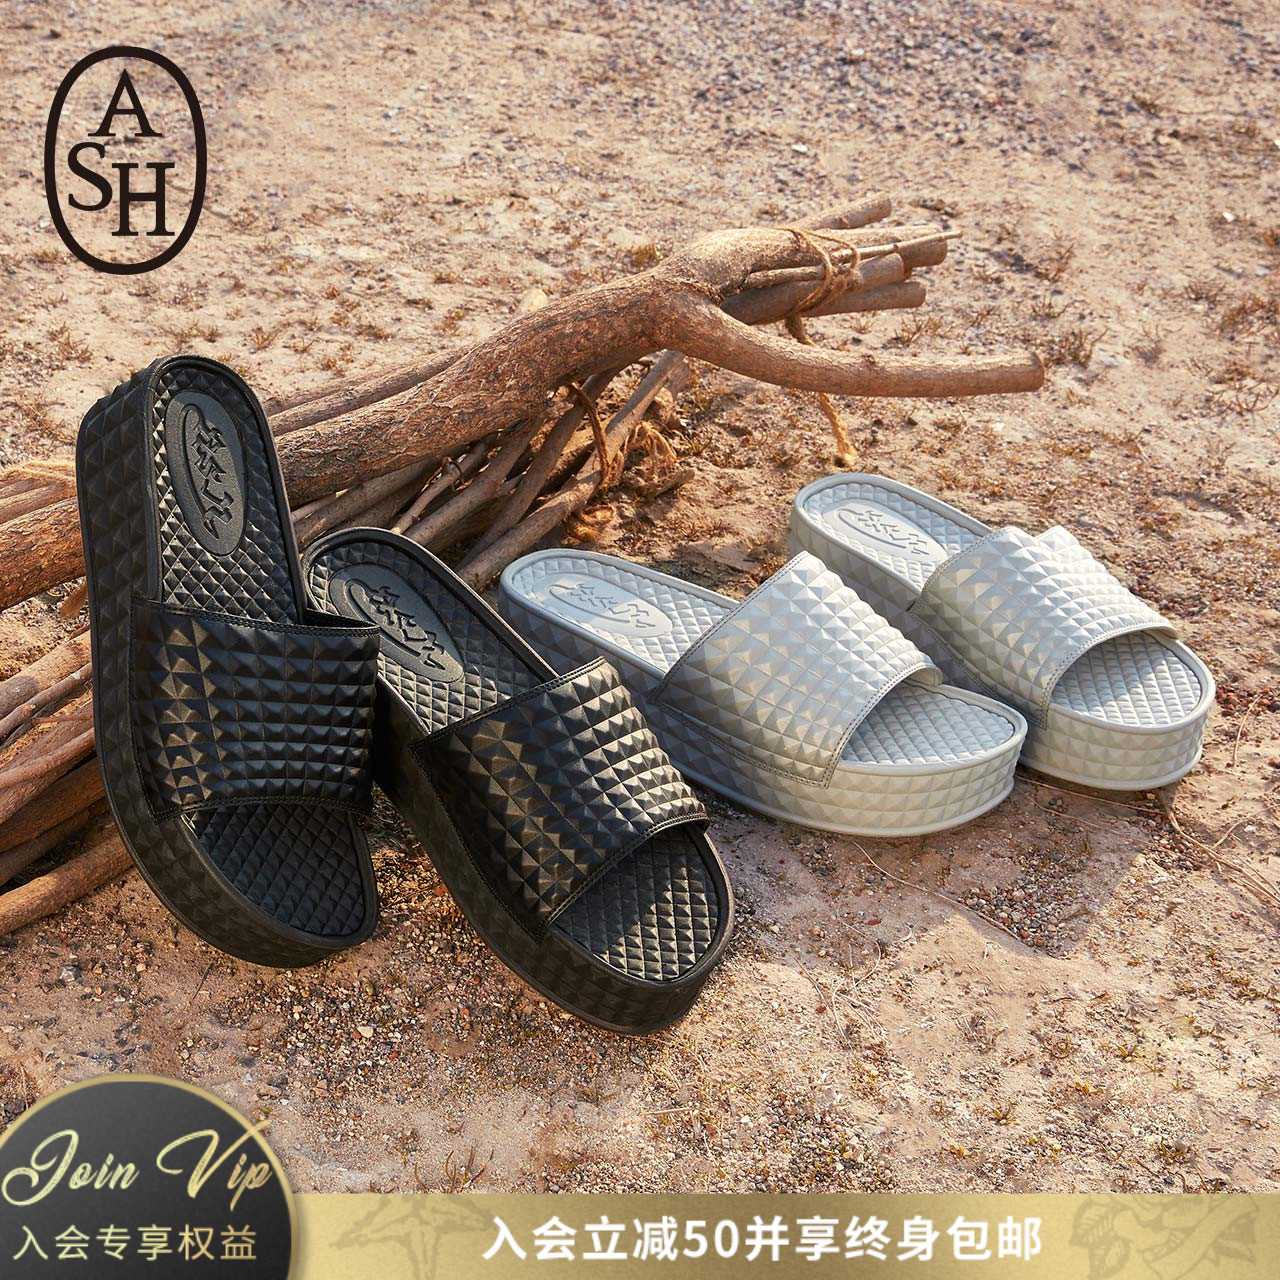 ASH女鞋2018夏季新款SCREAM系列时尚立体压纹厚底凉鞋休闲拖鞋